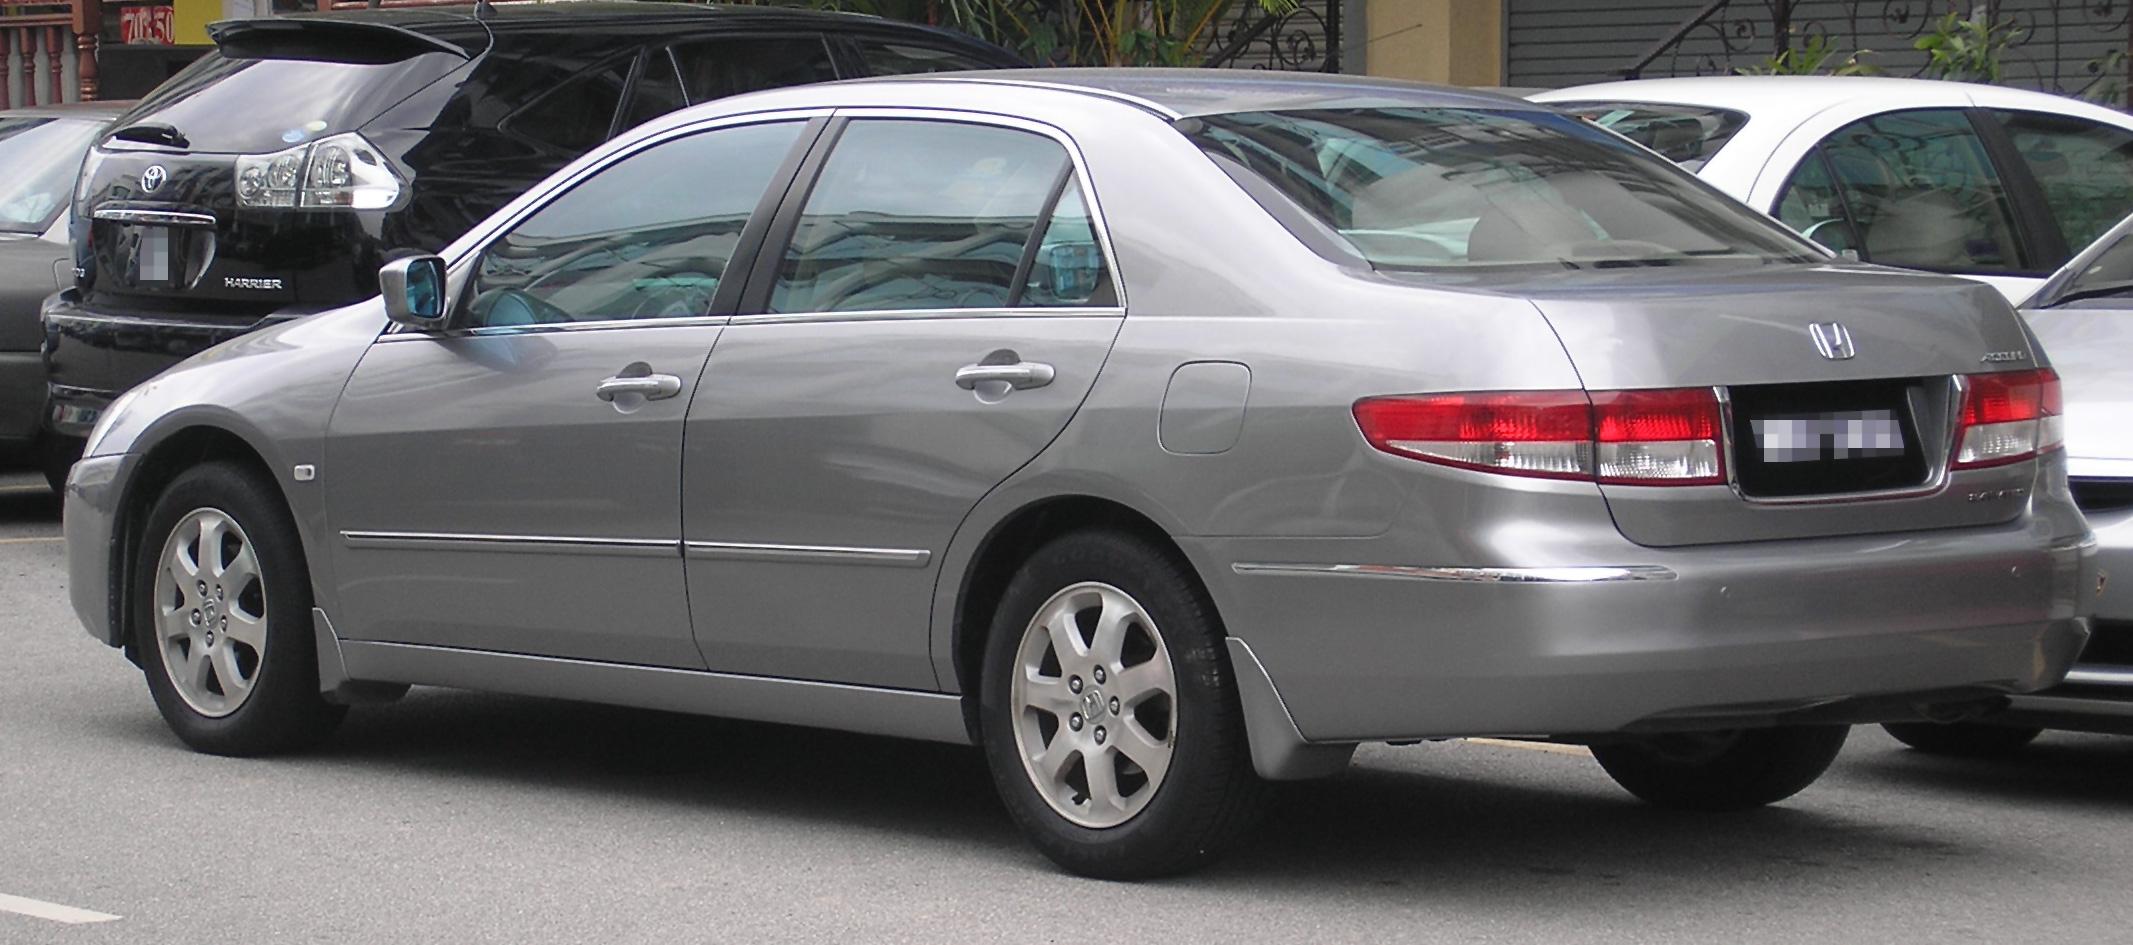 File:Honda Accord (seventh generation) (rear), Serdang.jpg - Wikimedia ...